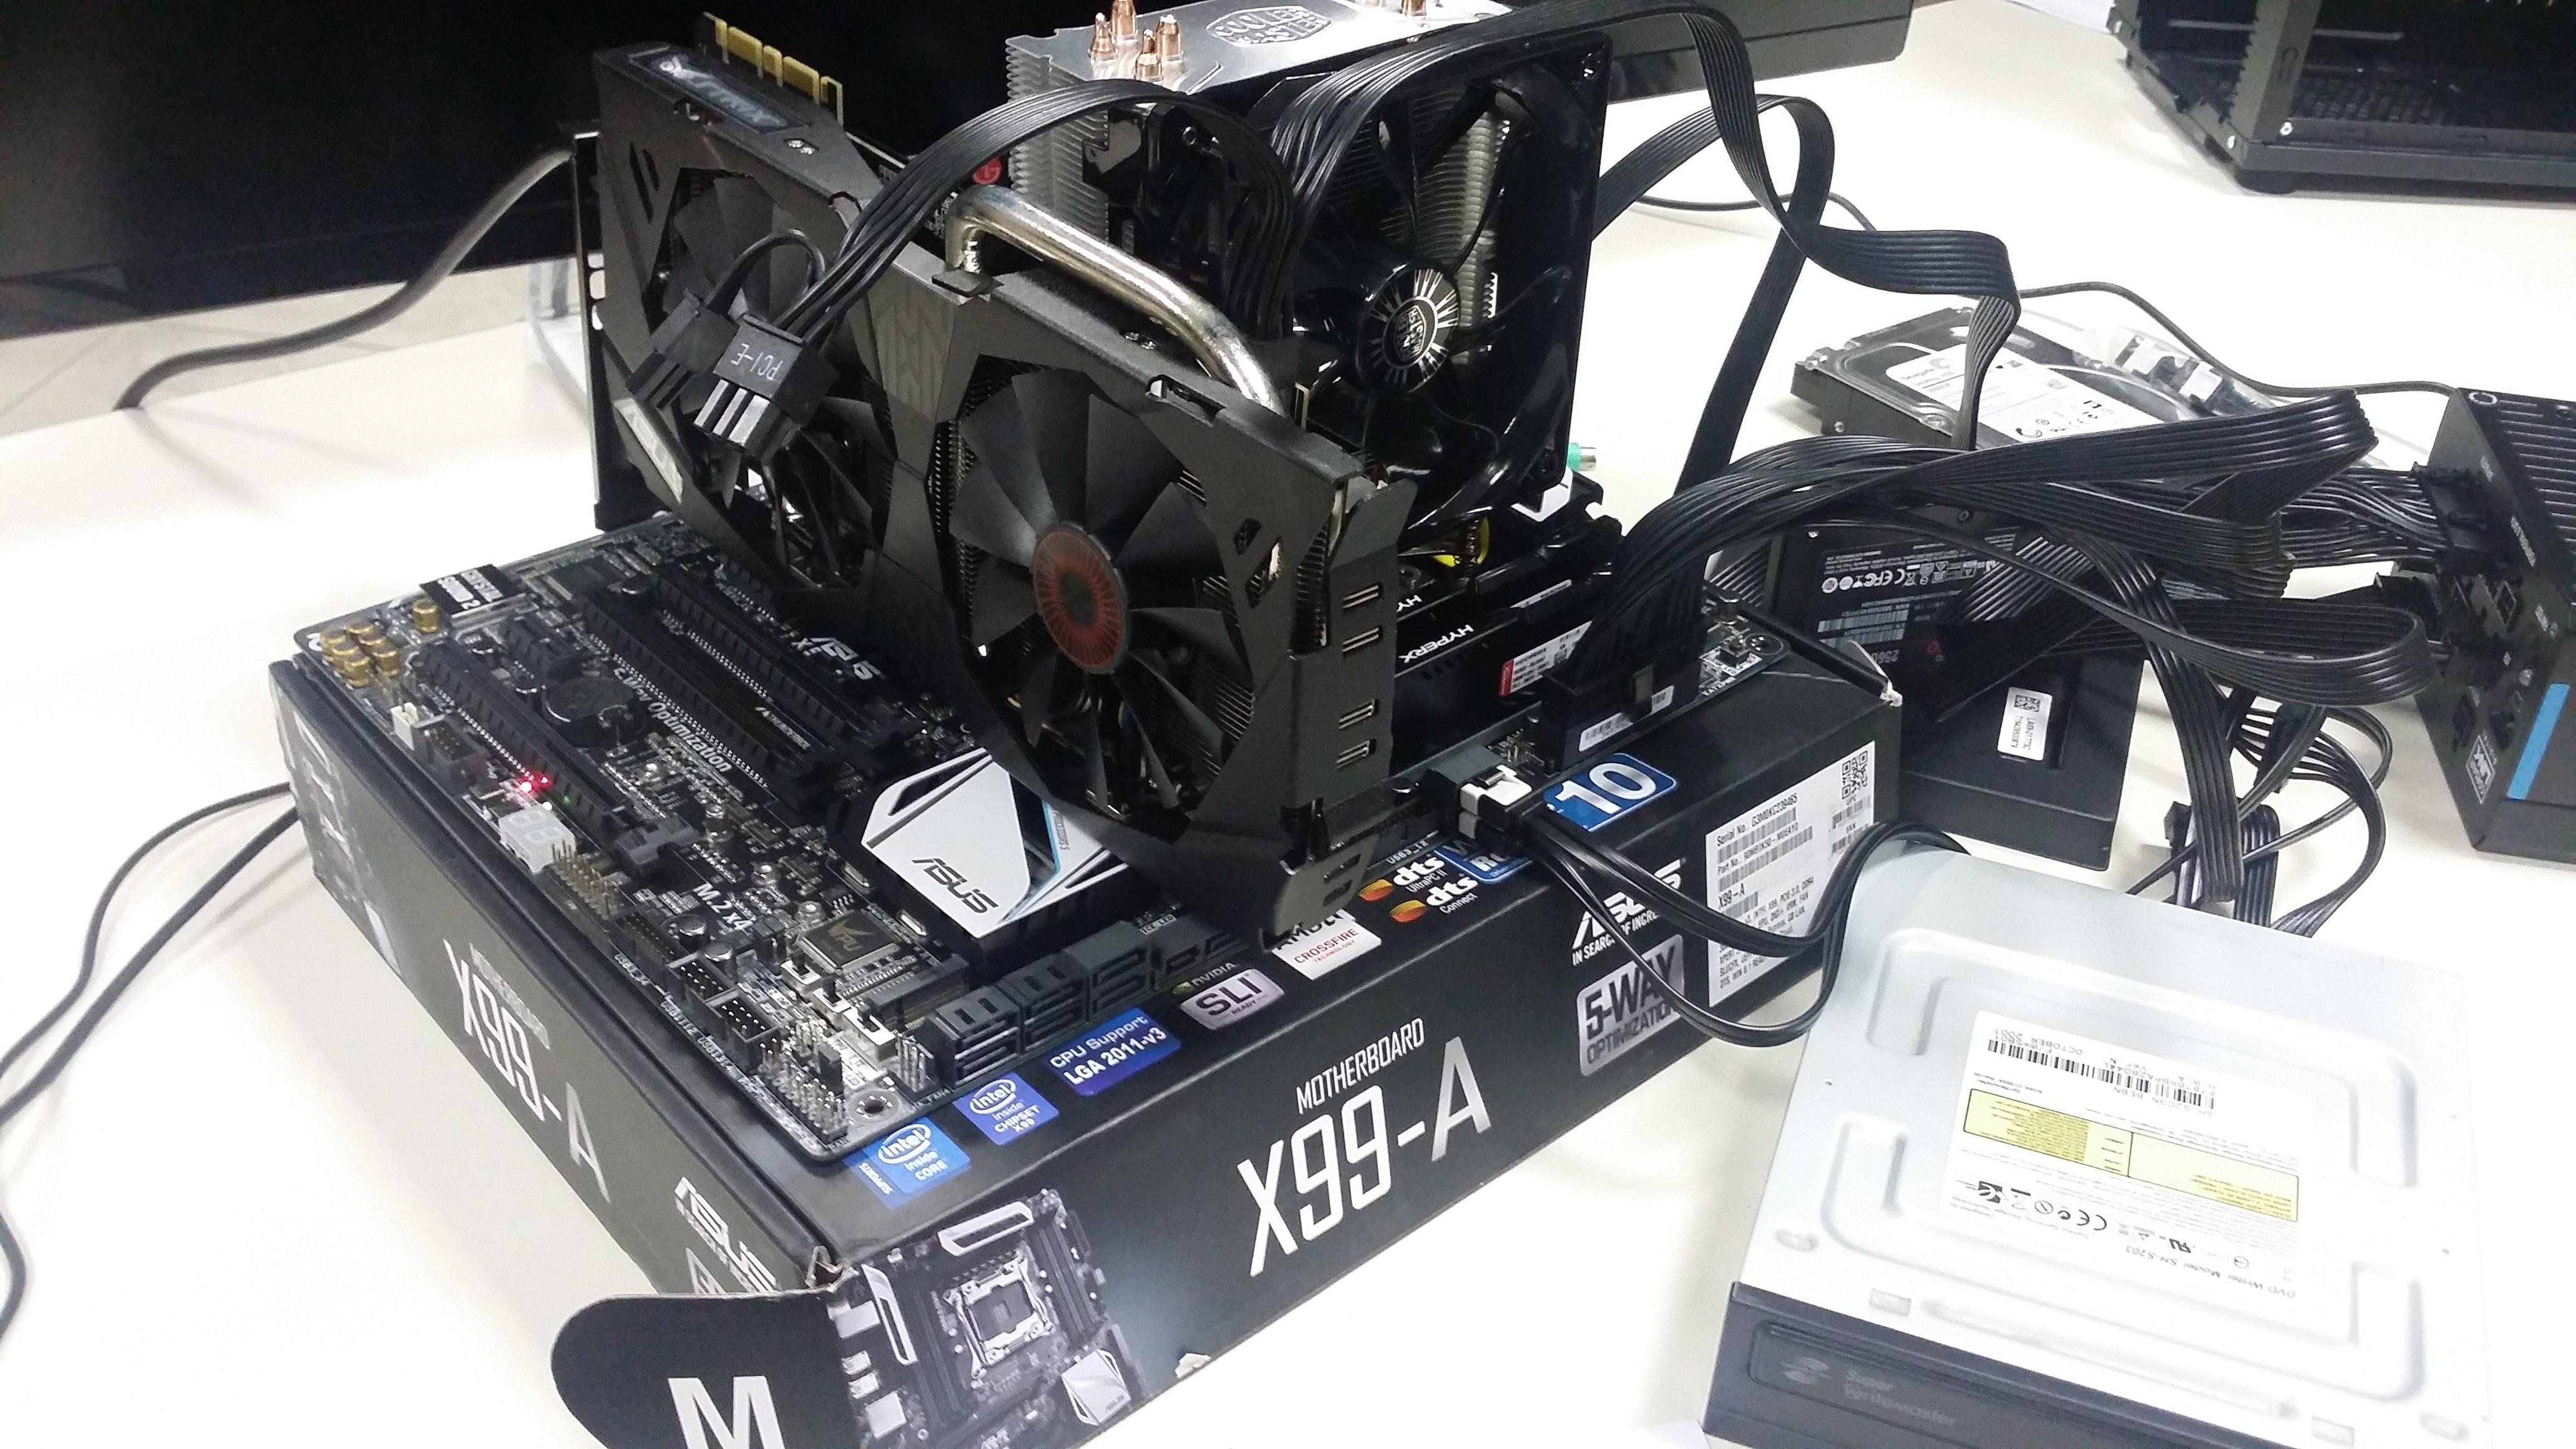 Work station CPU: i7 5820K (6core / 12 thread) Asus x99 - A, Nvidia Strix 970, Smsung 850 PRO SSD, Corsar HX750W PSU